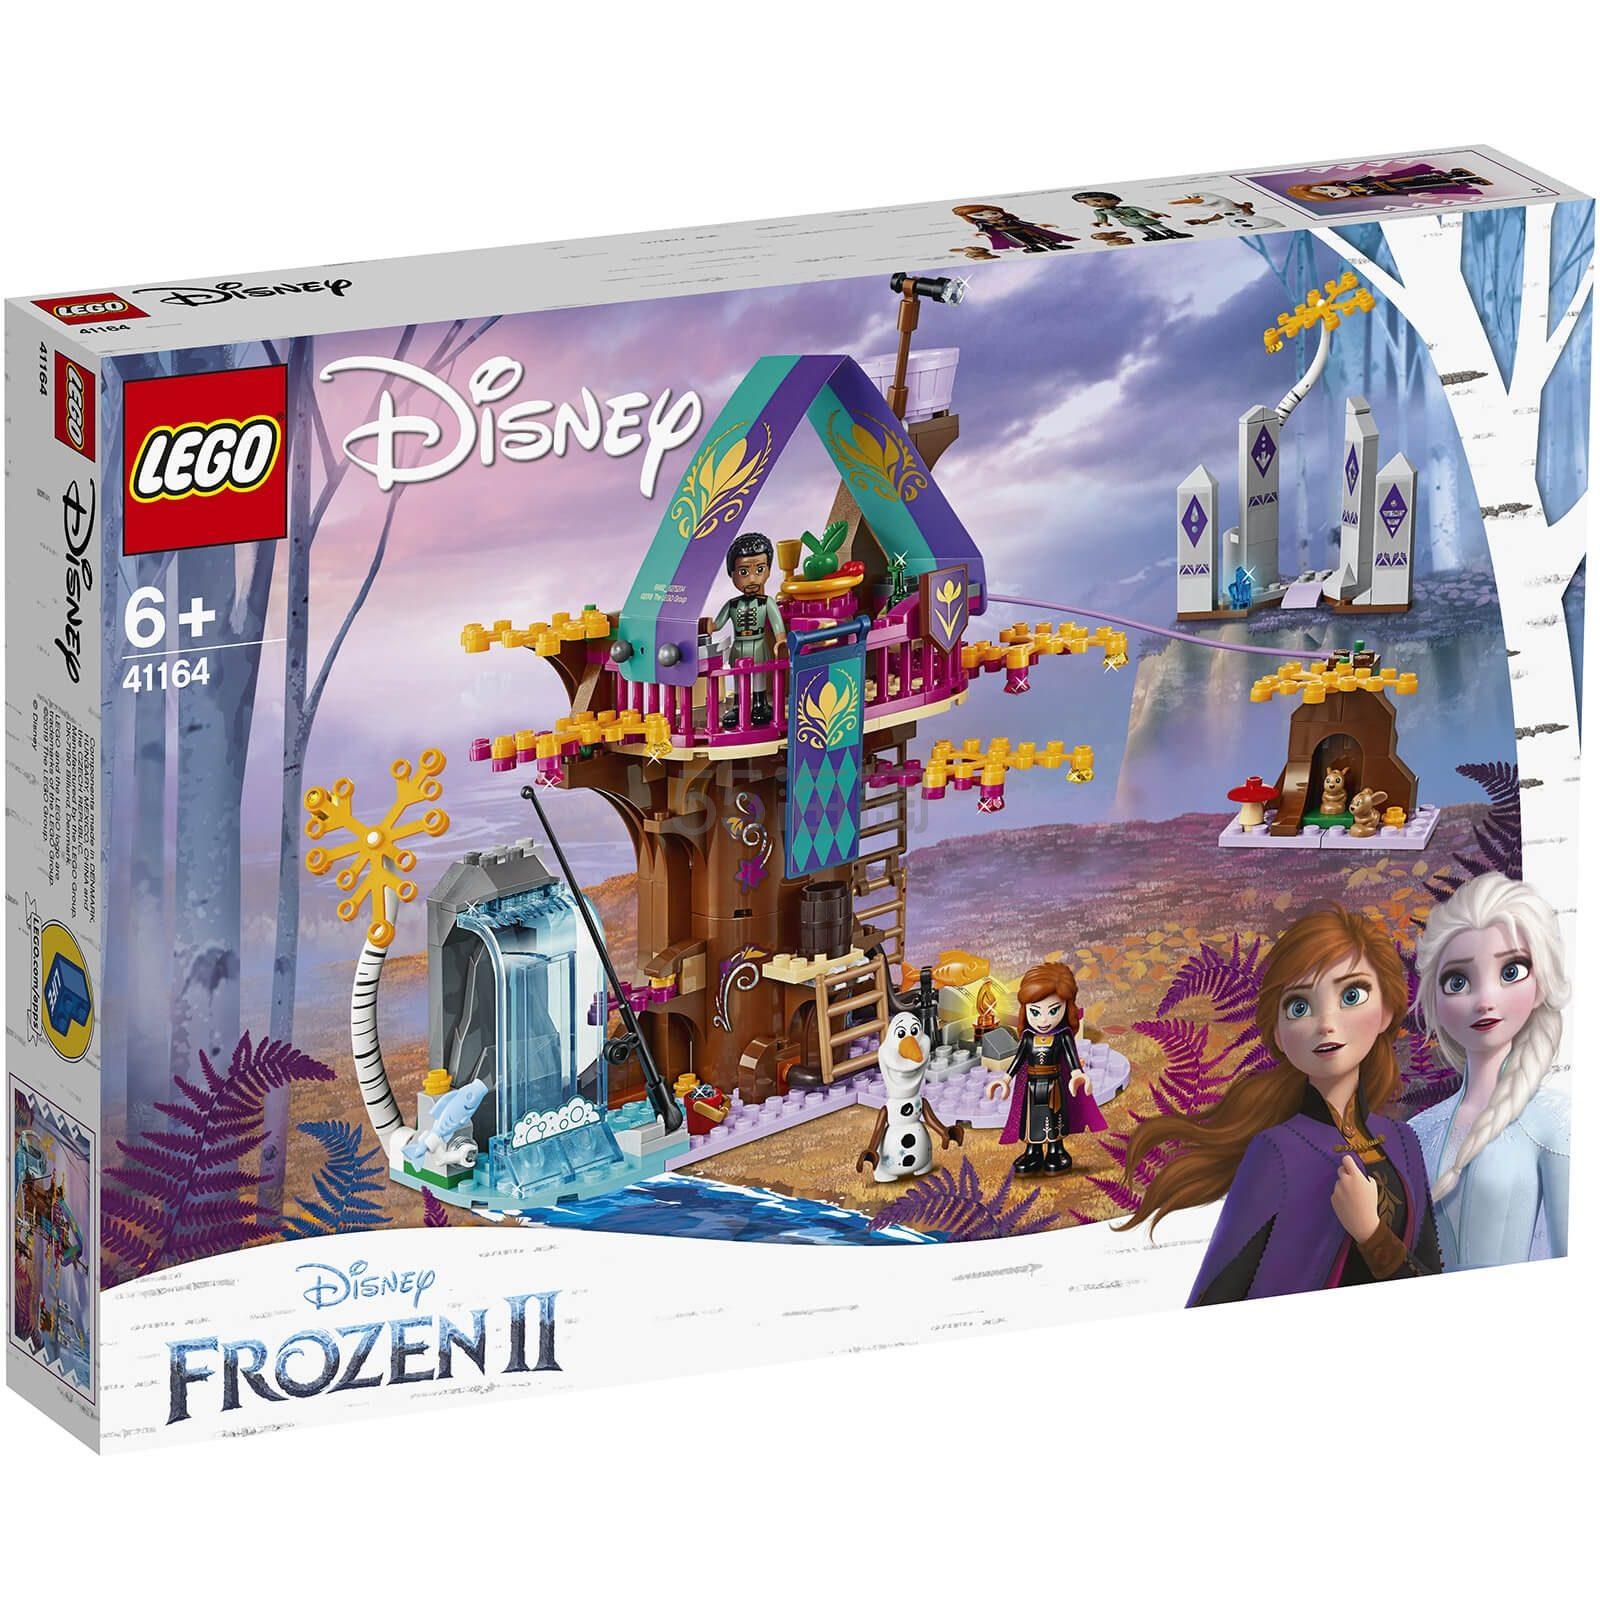 LEGO 乐高 迪士尼公主 魔法树屋 (41164)